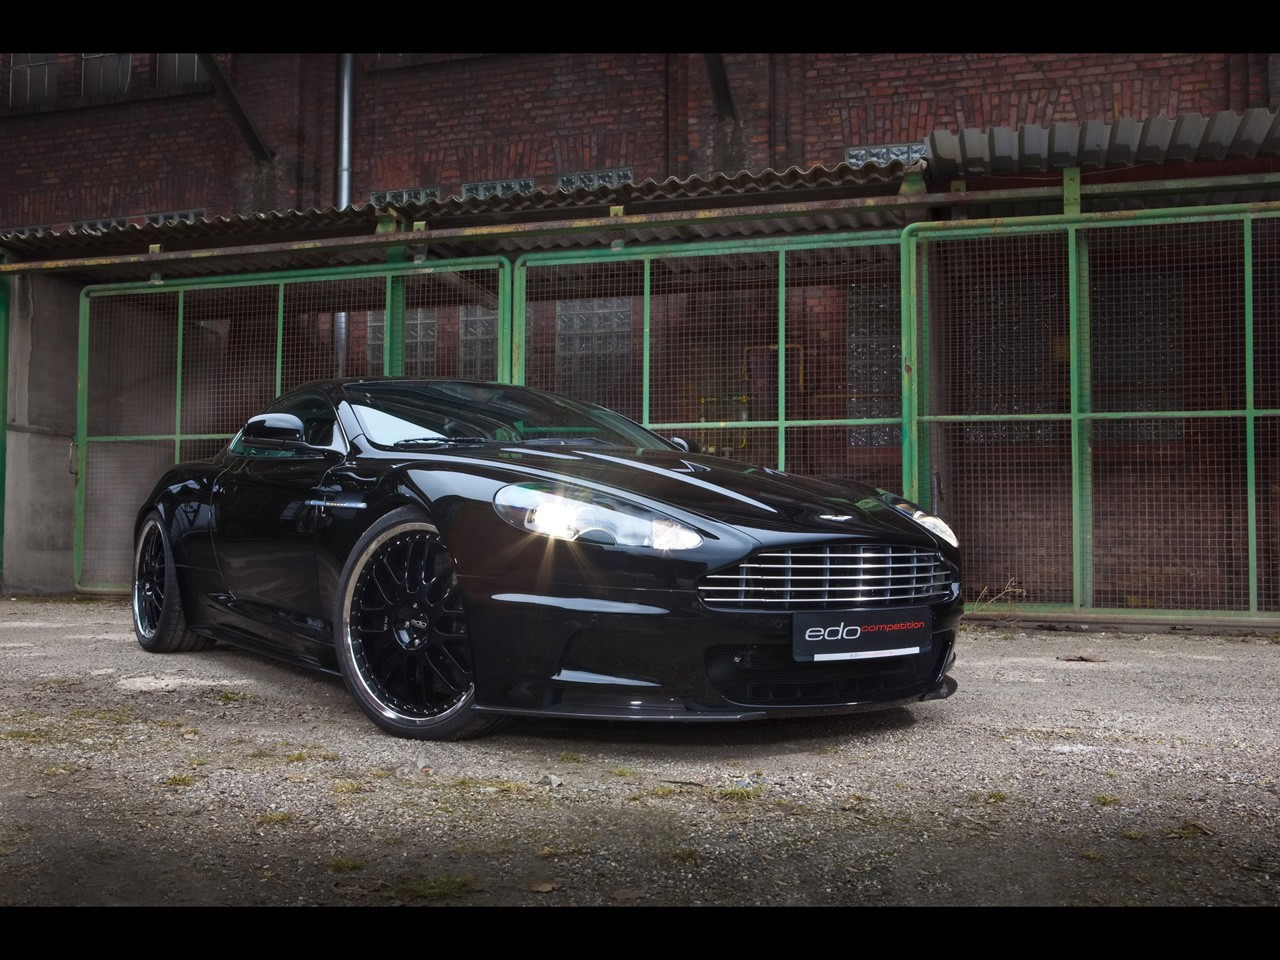 2010 Edo Competition - Aston Martin DBS Dashboard